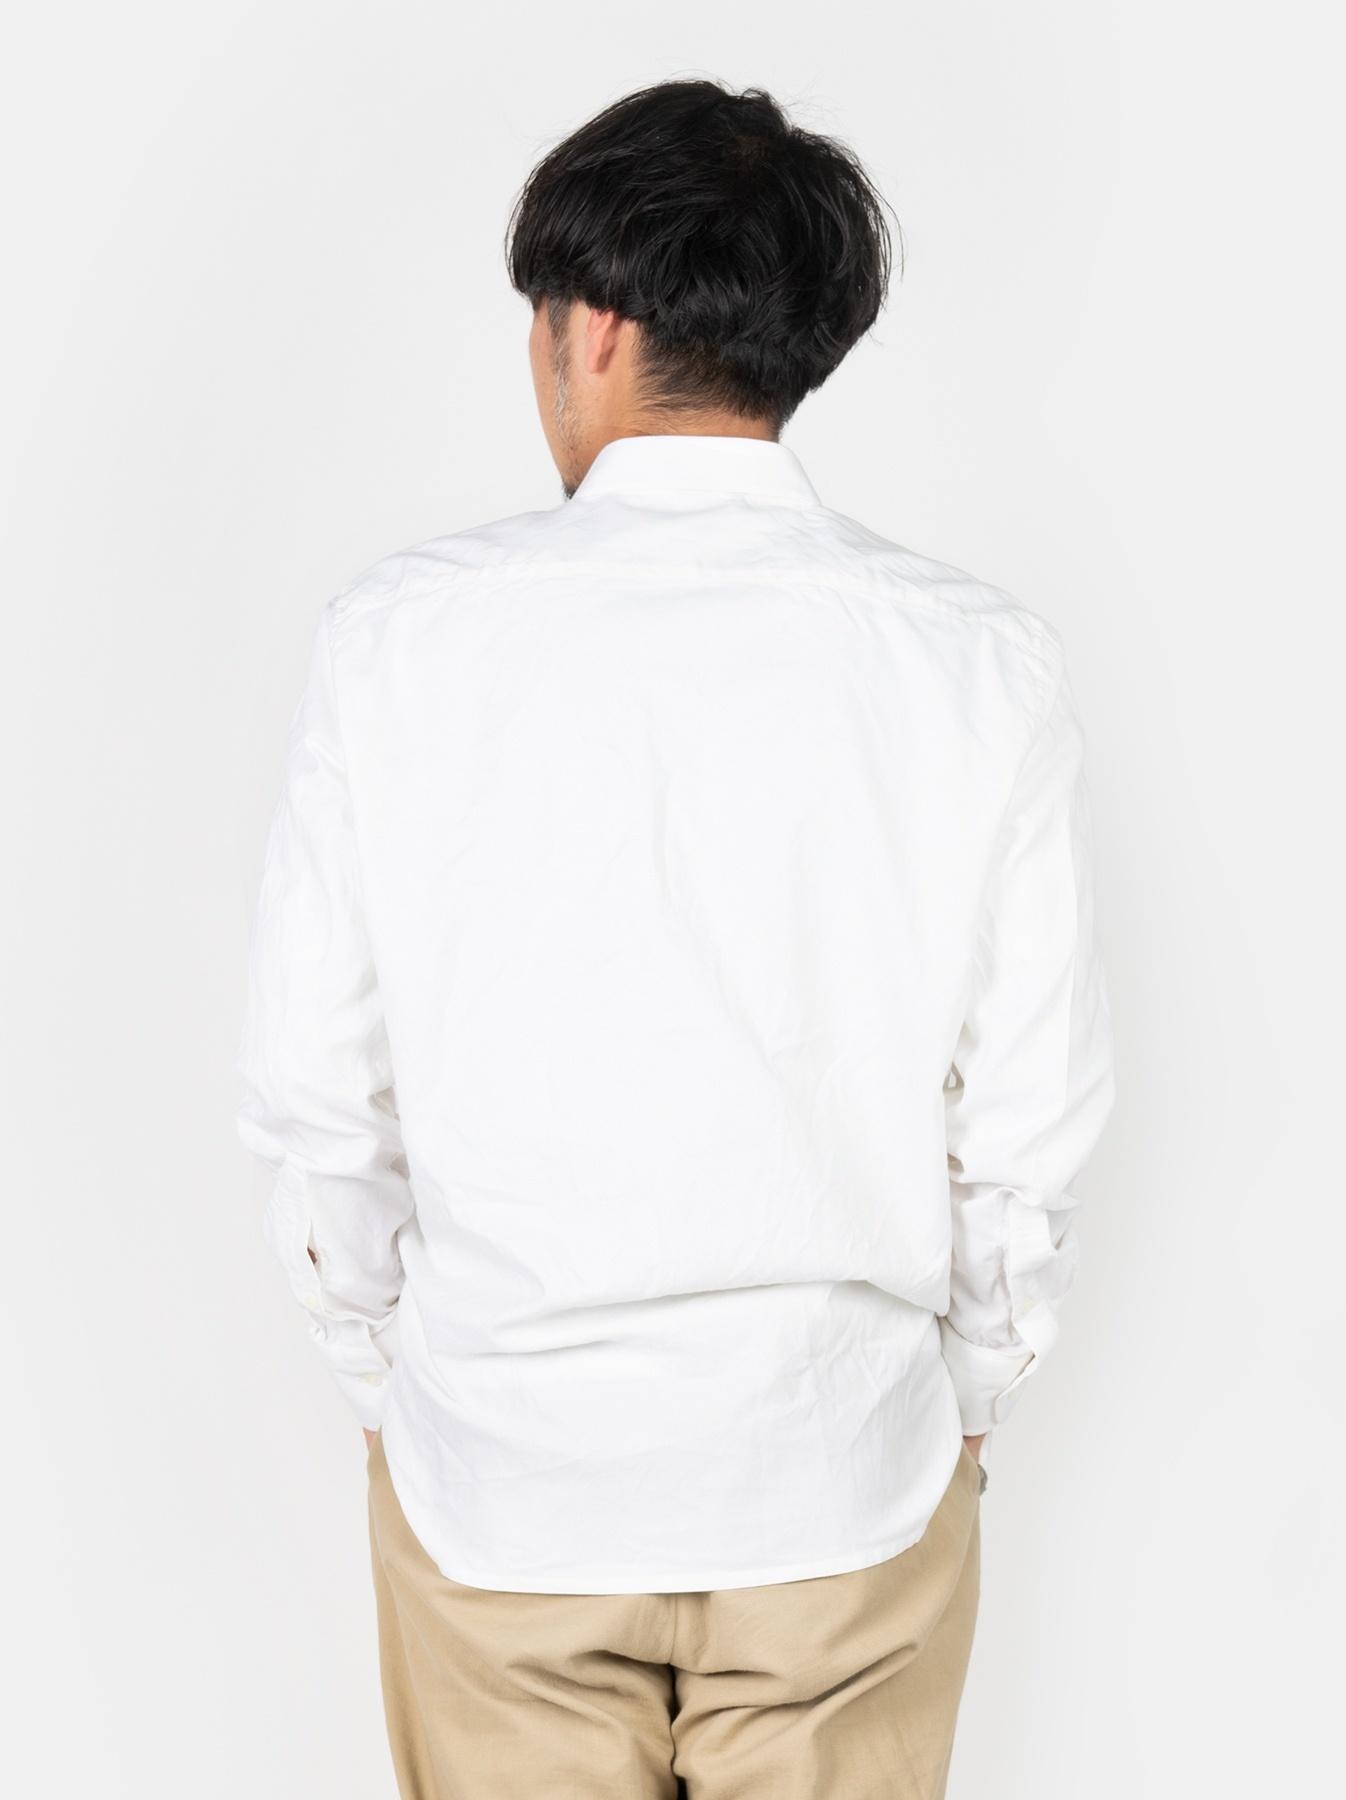 WH Oxford 908 Round Collar Shirt-5